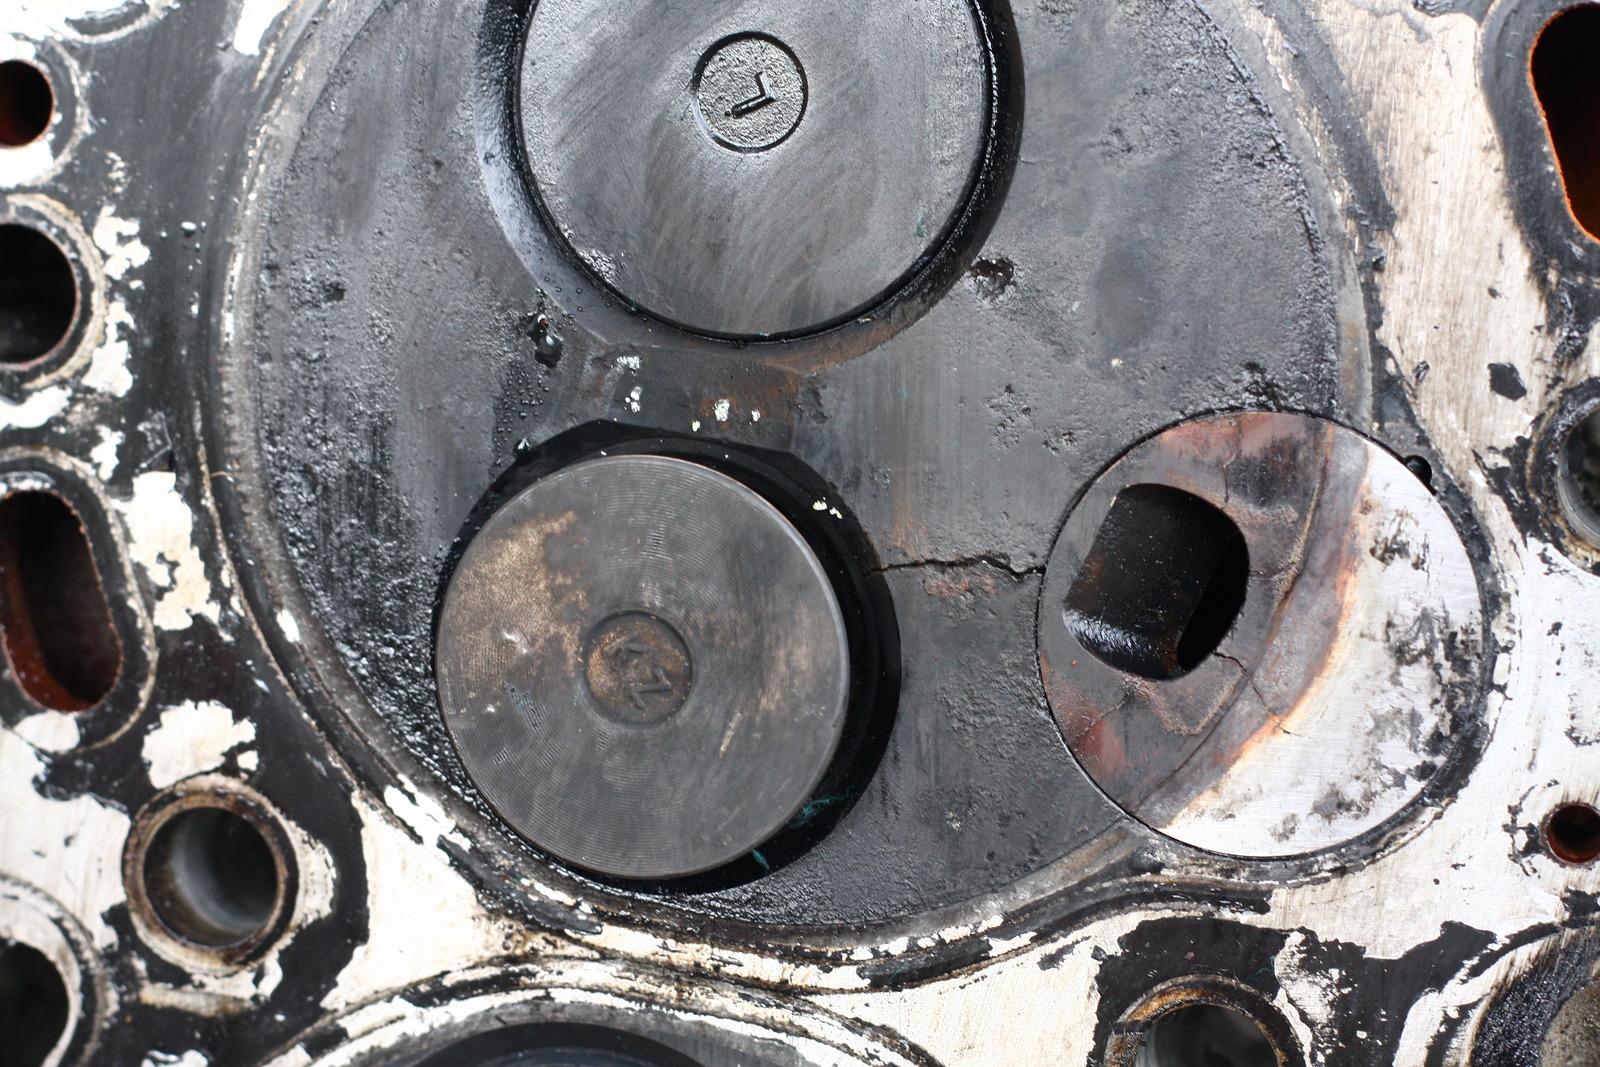 1kz Te Cylinder Head Crack Detector - somelivin